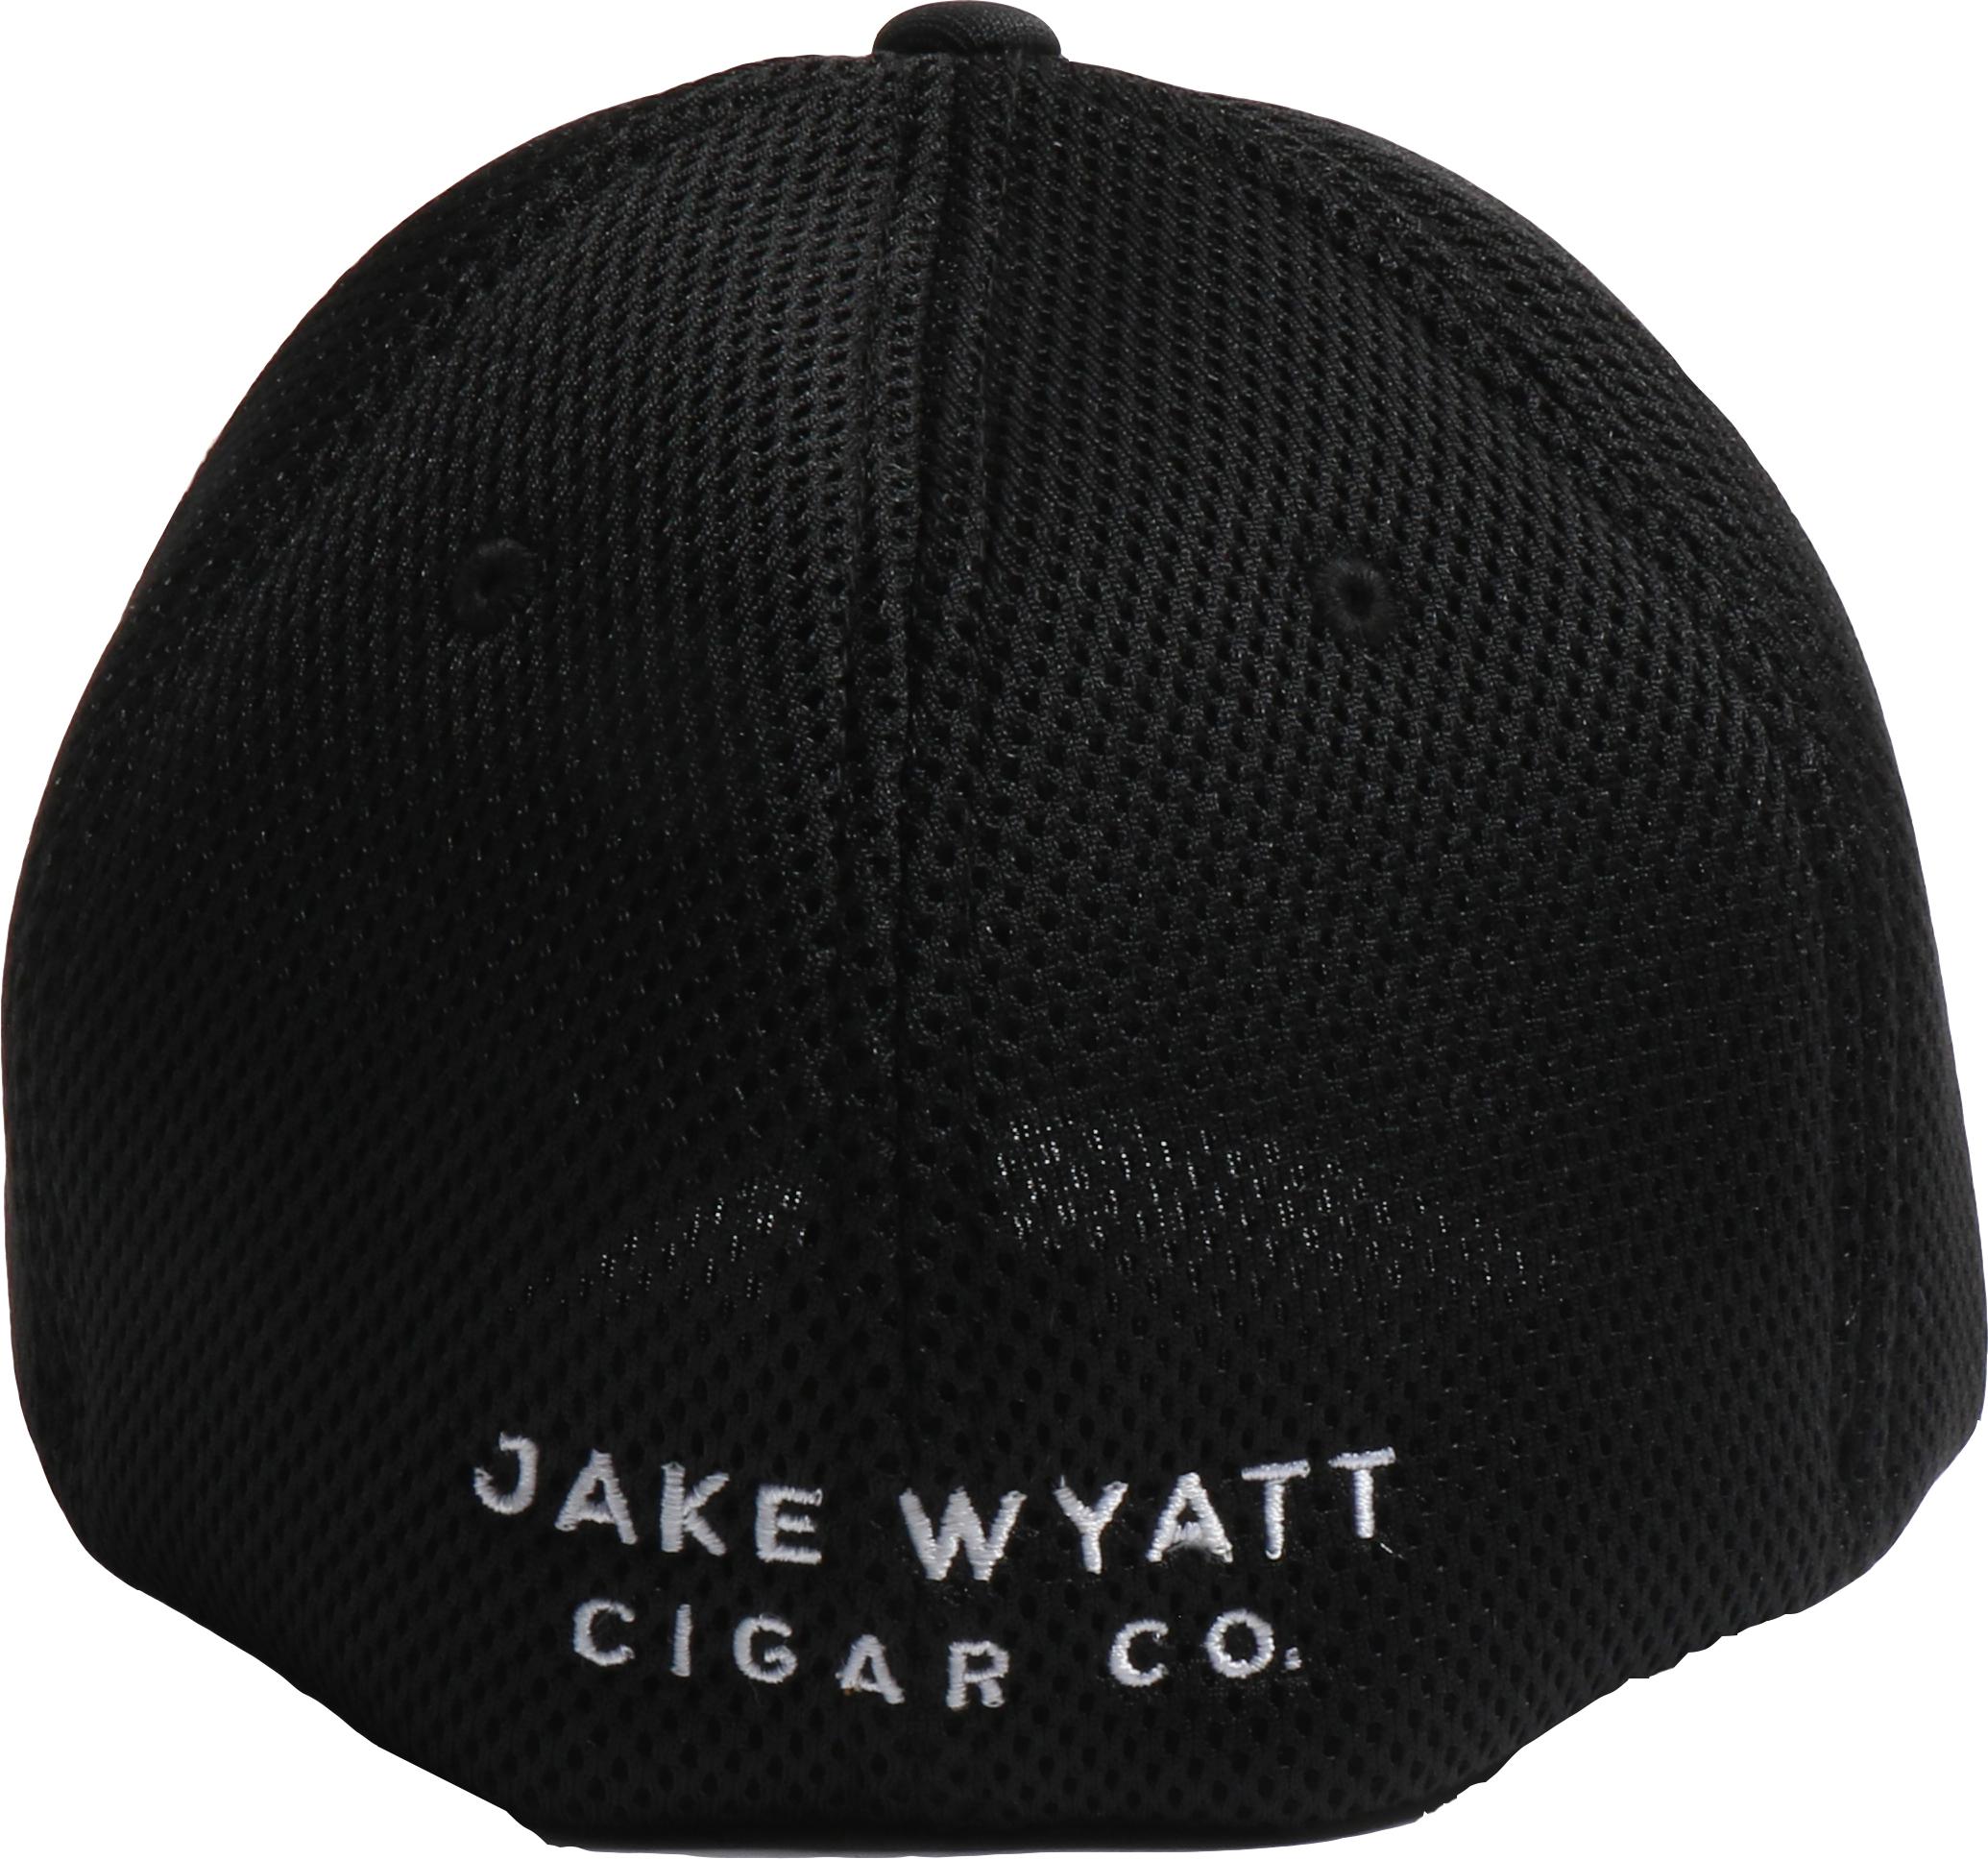 Jake Wyatt Cigar Co. - Fitted Hat